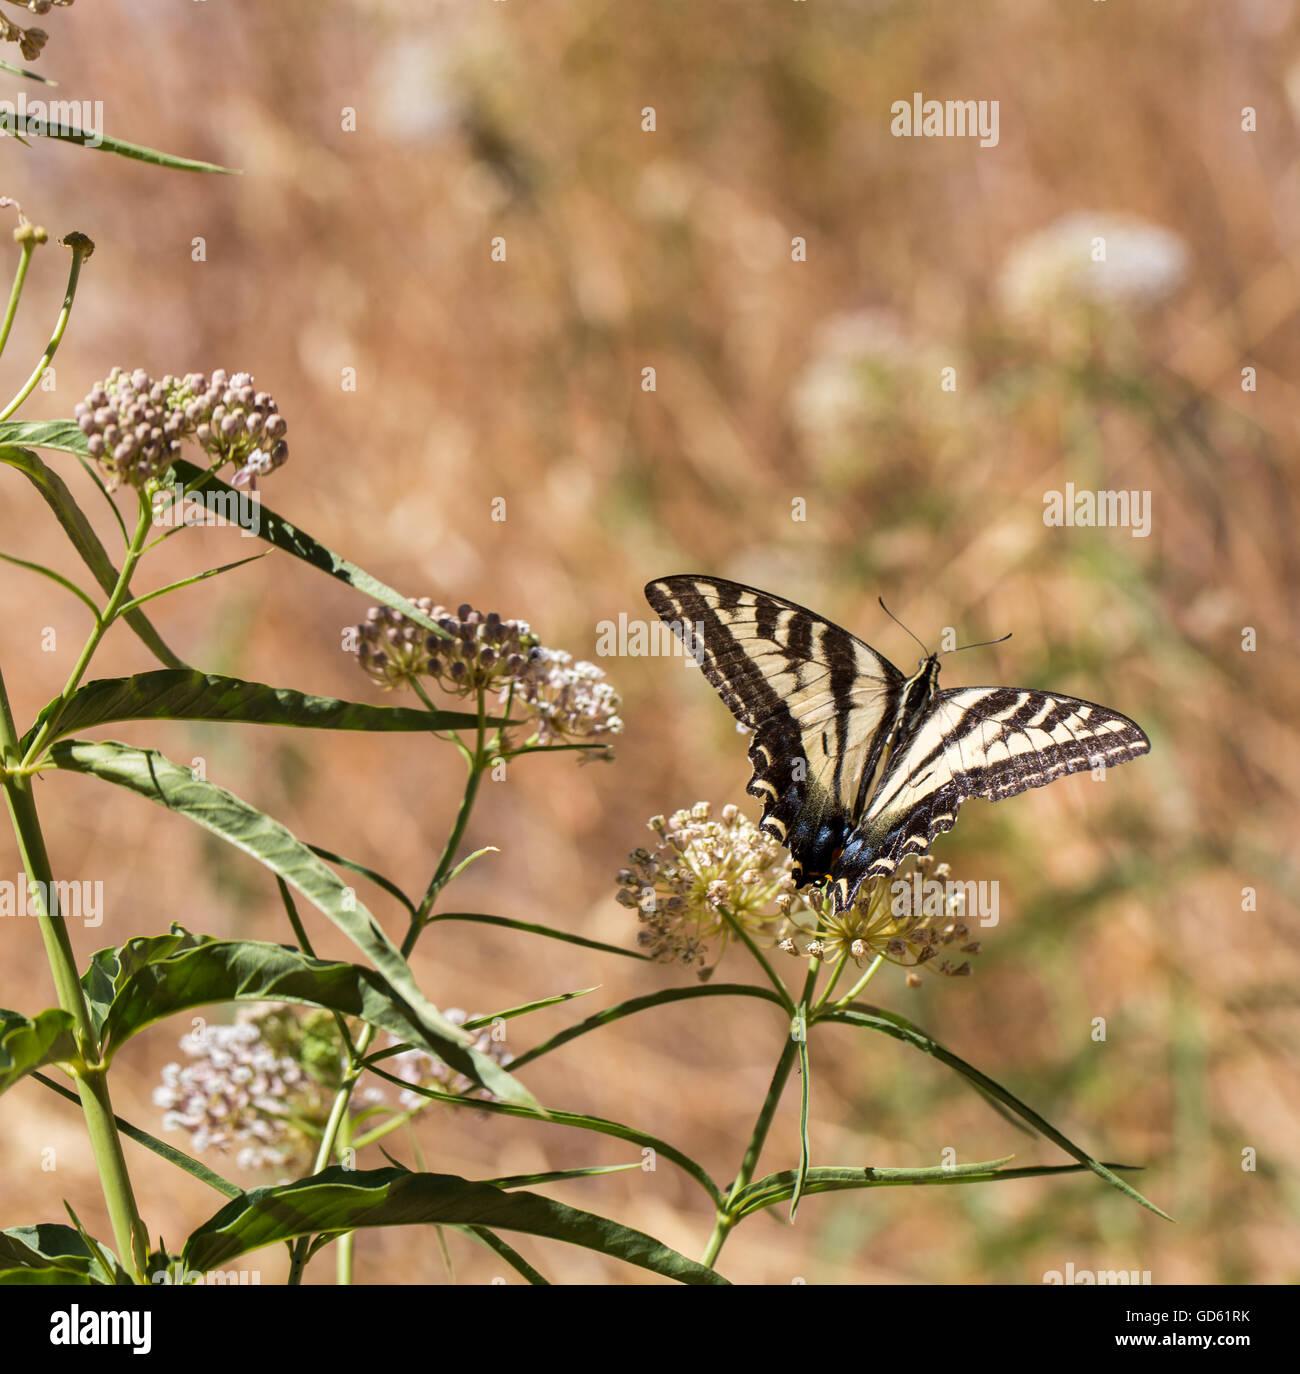 Anise Swallowtail - Papilio zelicaon - feeding off flower nectar - Stock Image